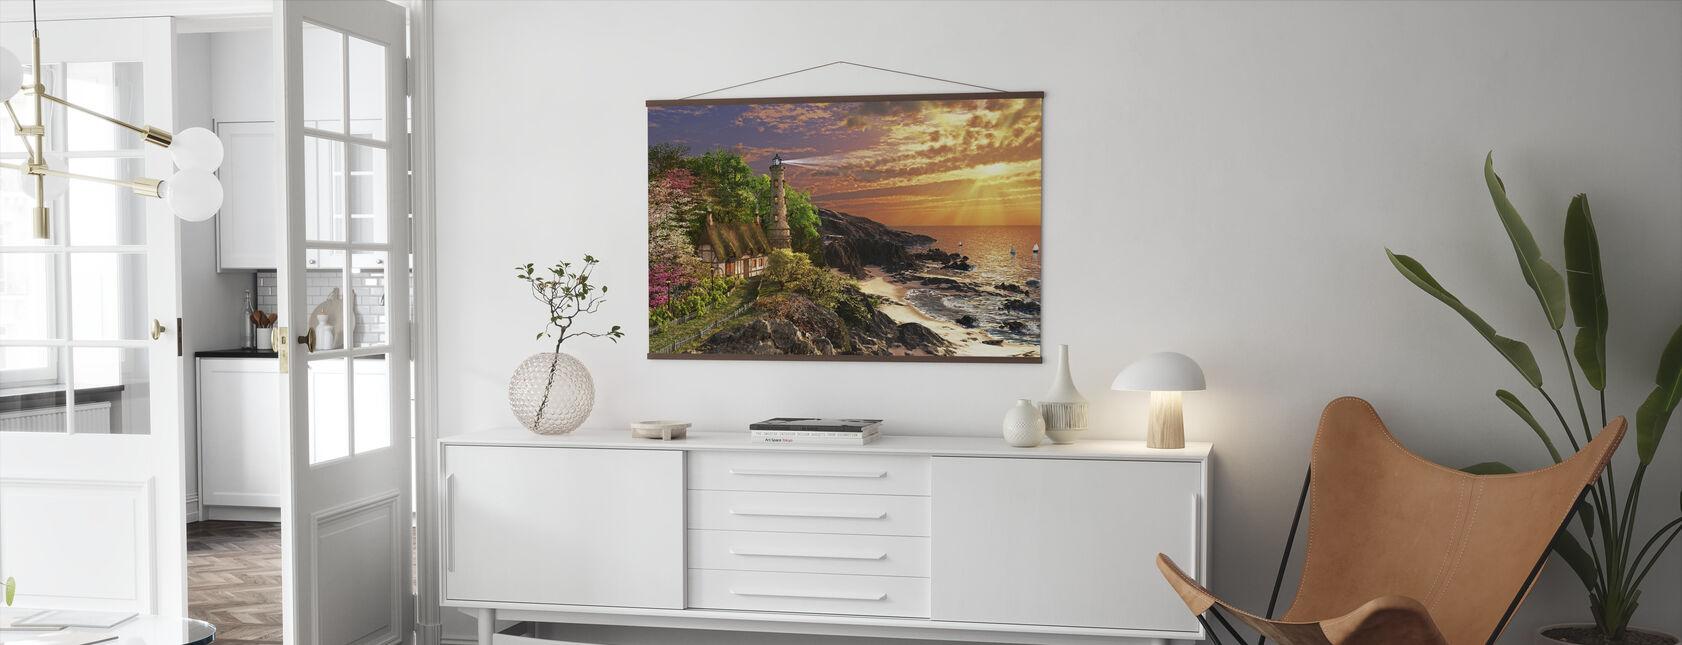 Stoney Cove - Poster - Living Room